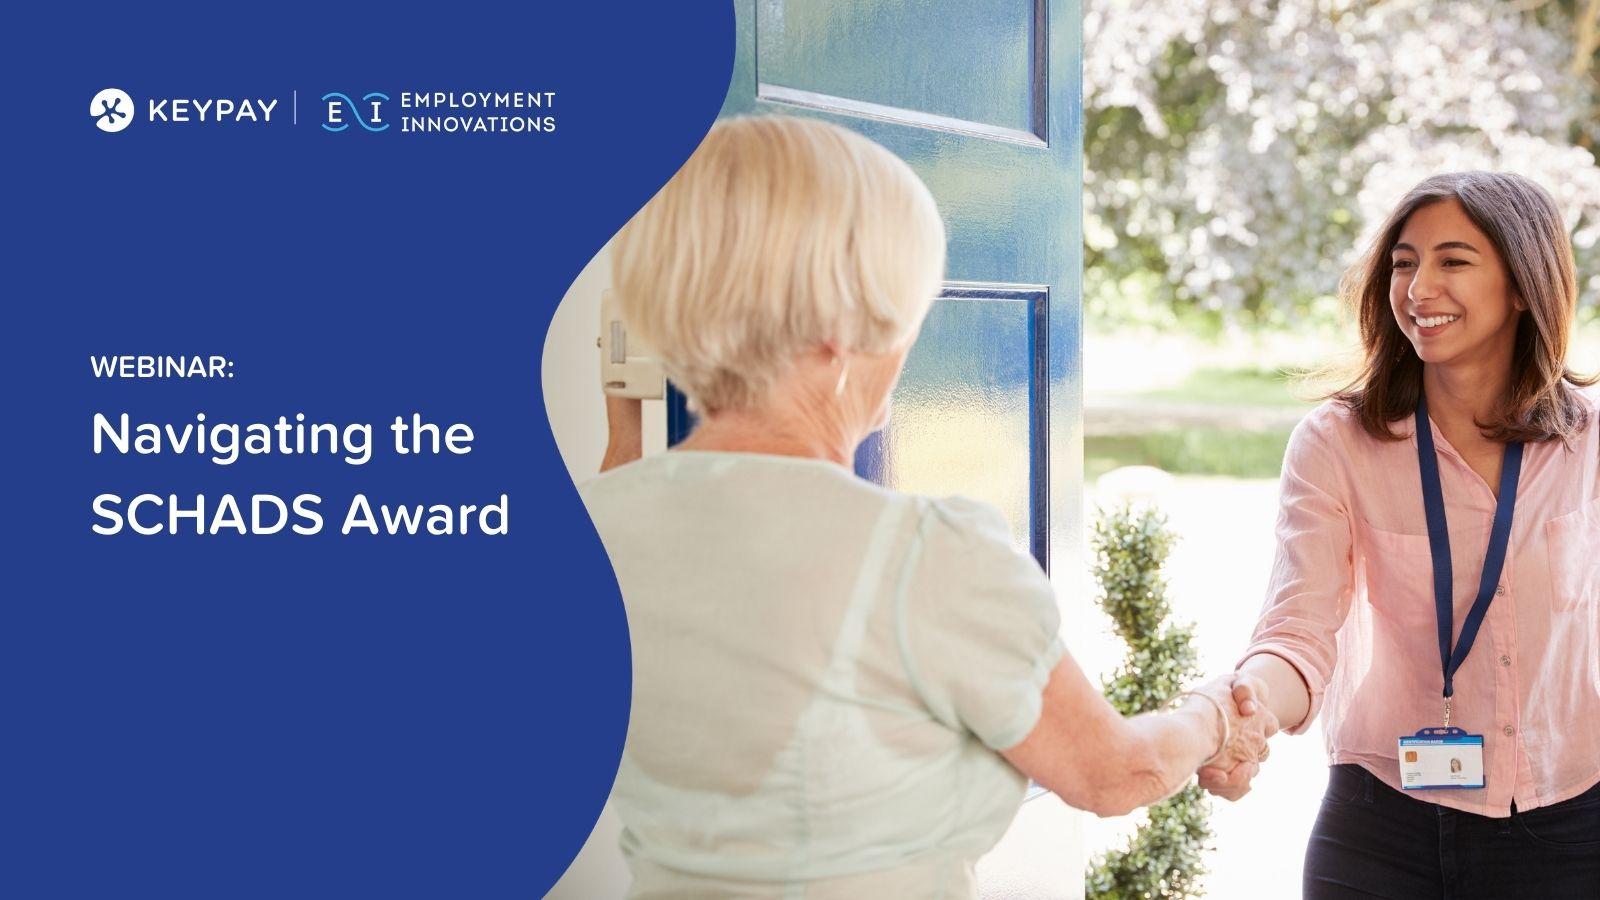 Navigating the SCHADS Award: KeyPay x Employment Innovations